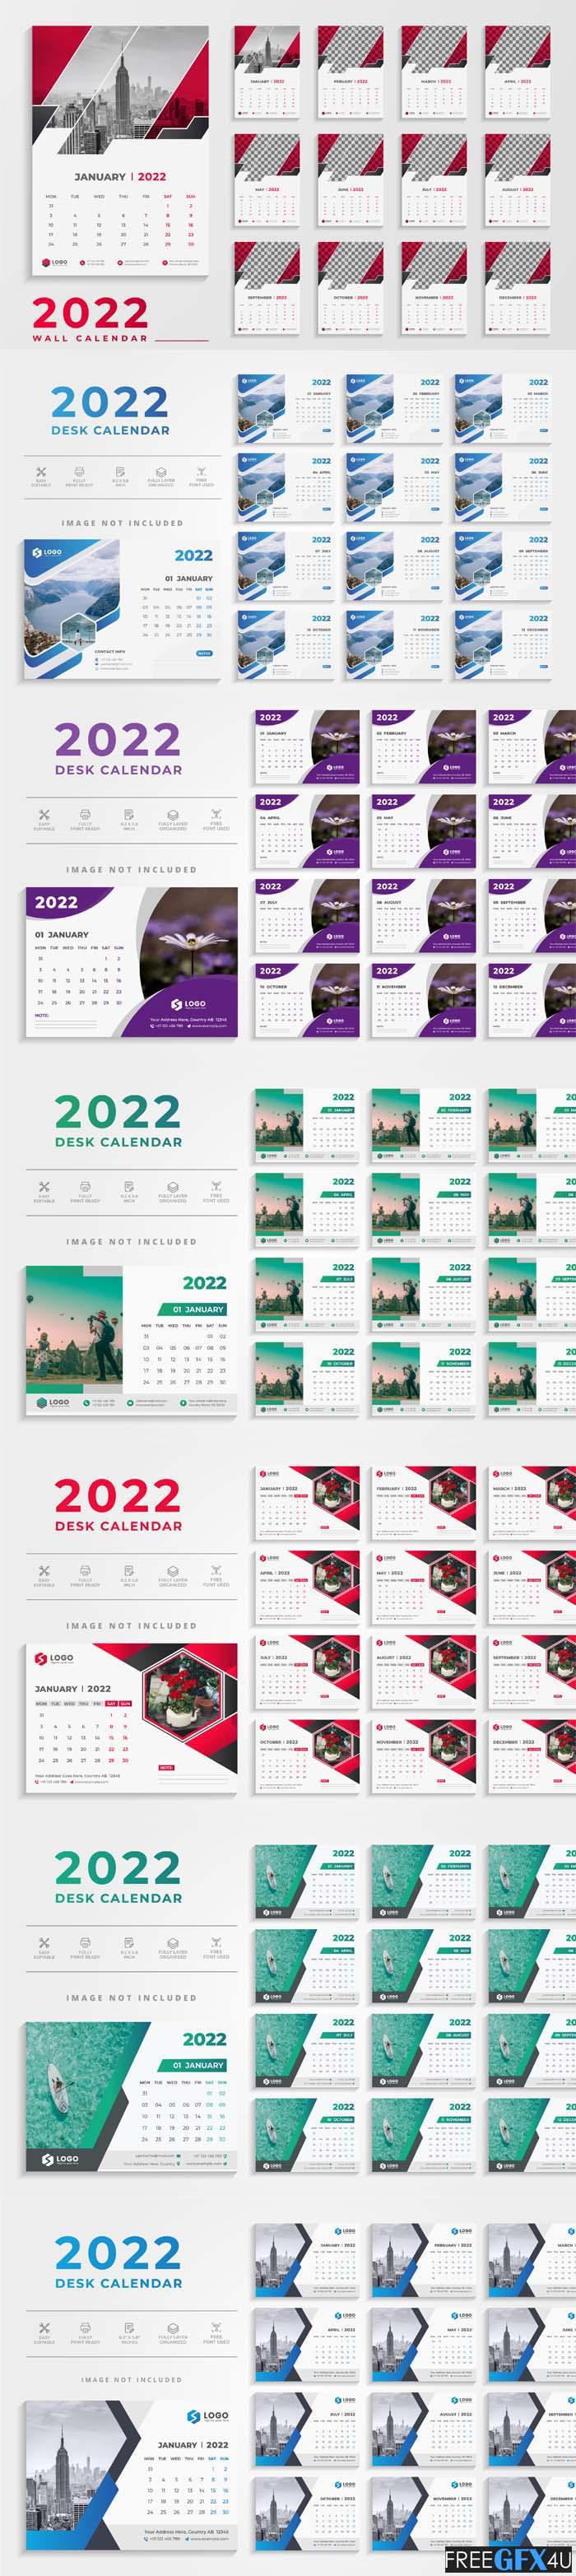 Modern Desk Calendar 2022 Vector Templates